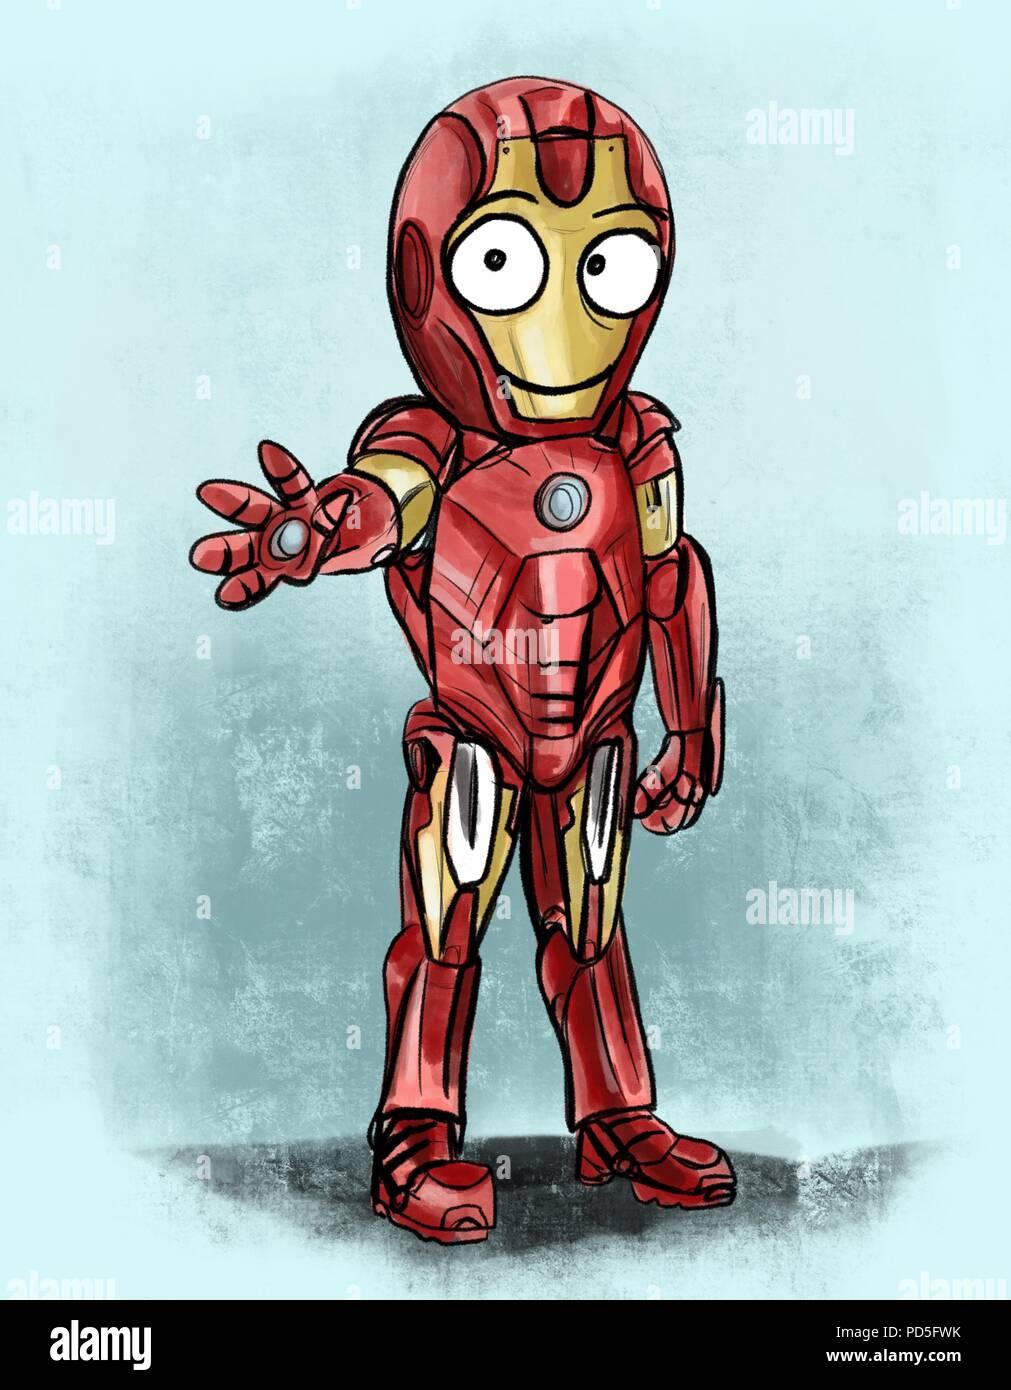 cute iron man - Stock Image